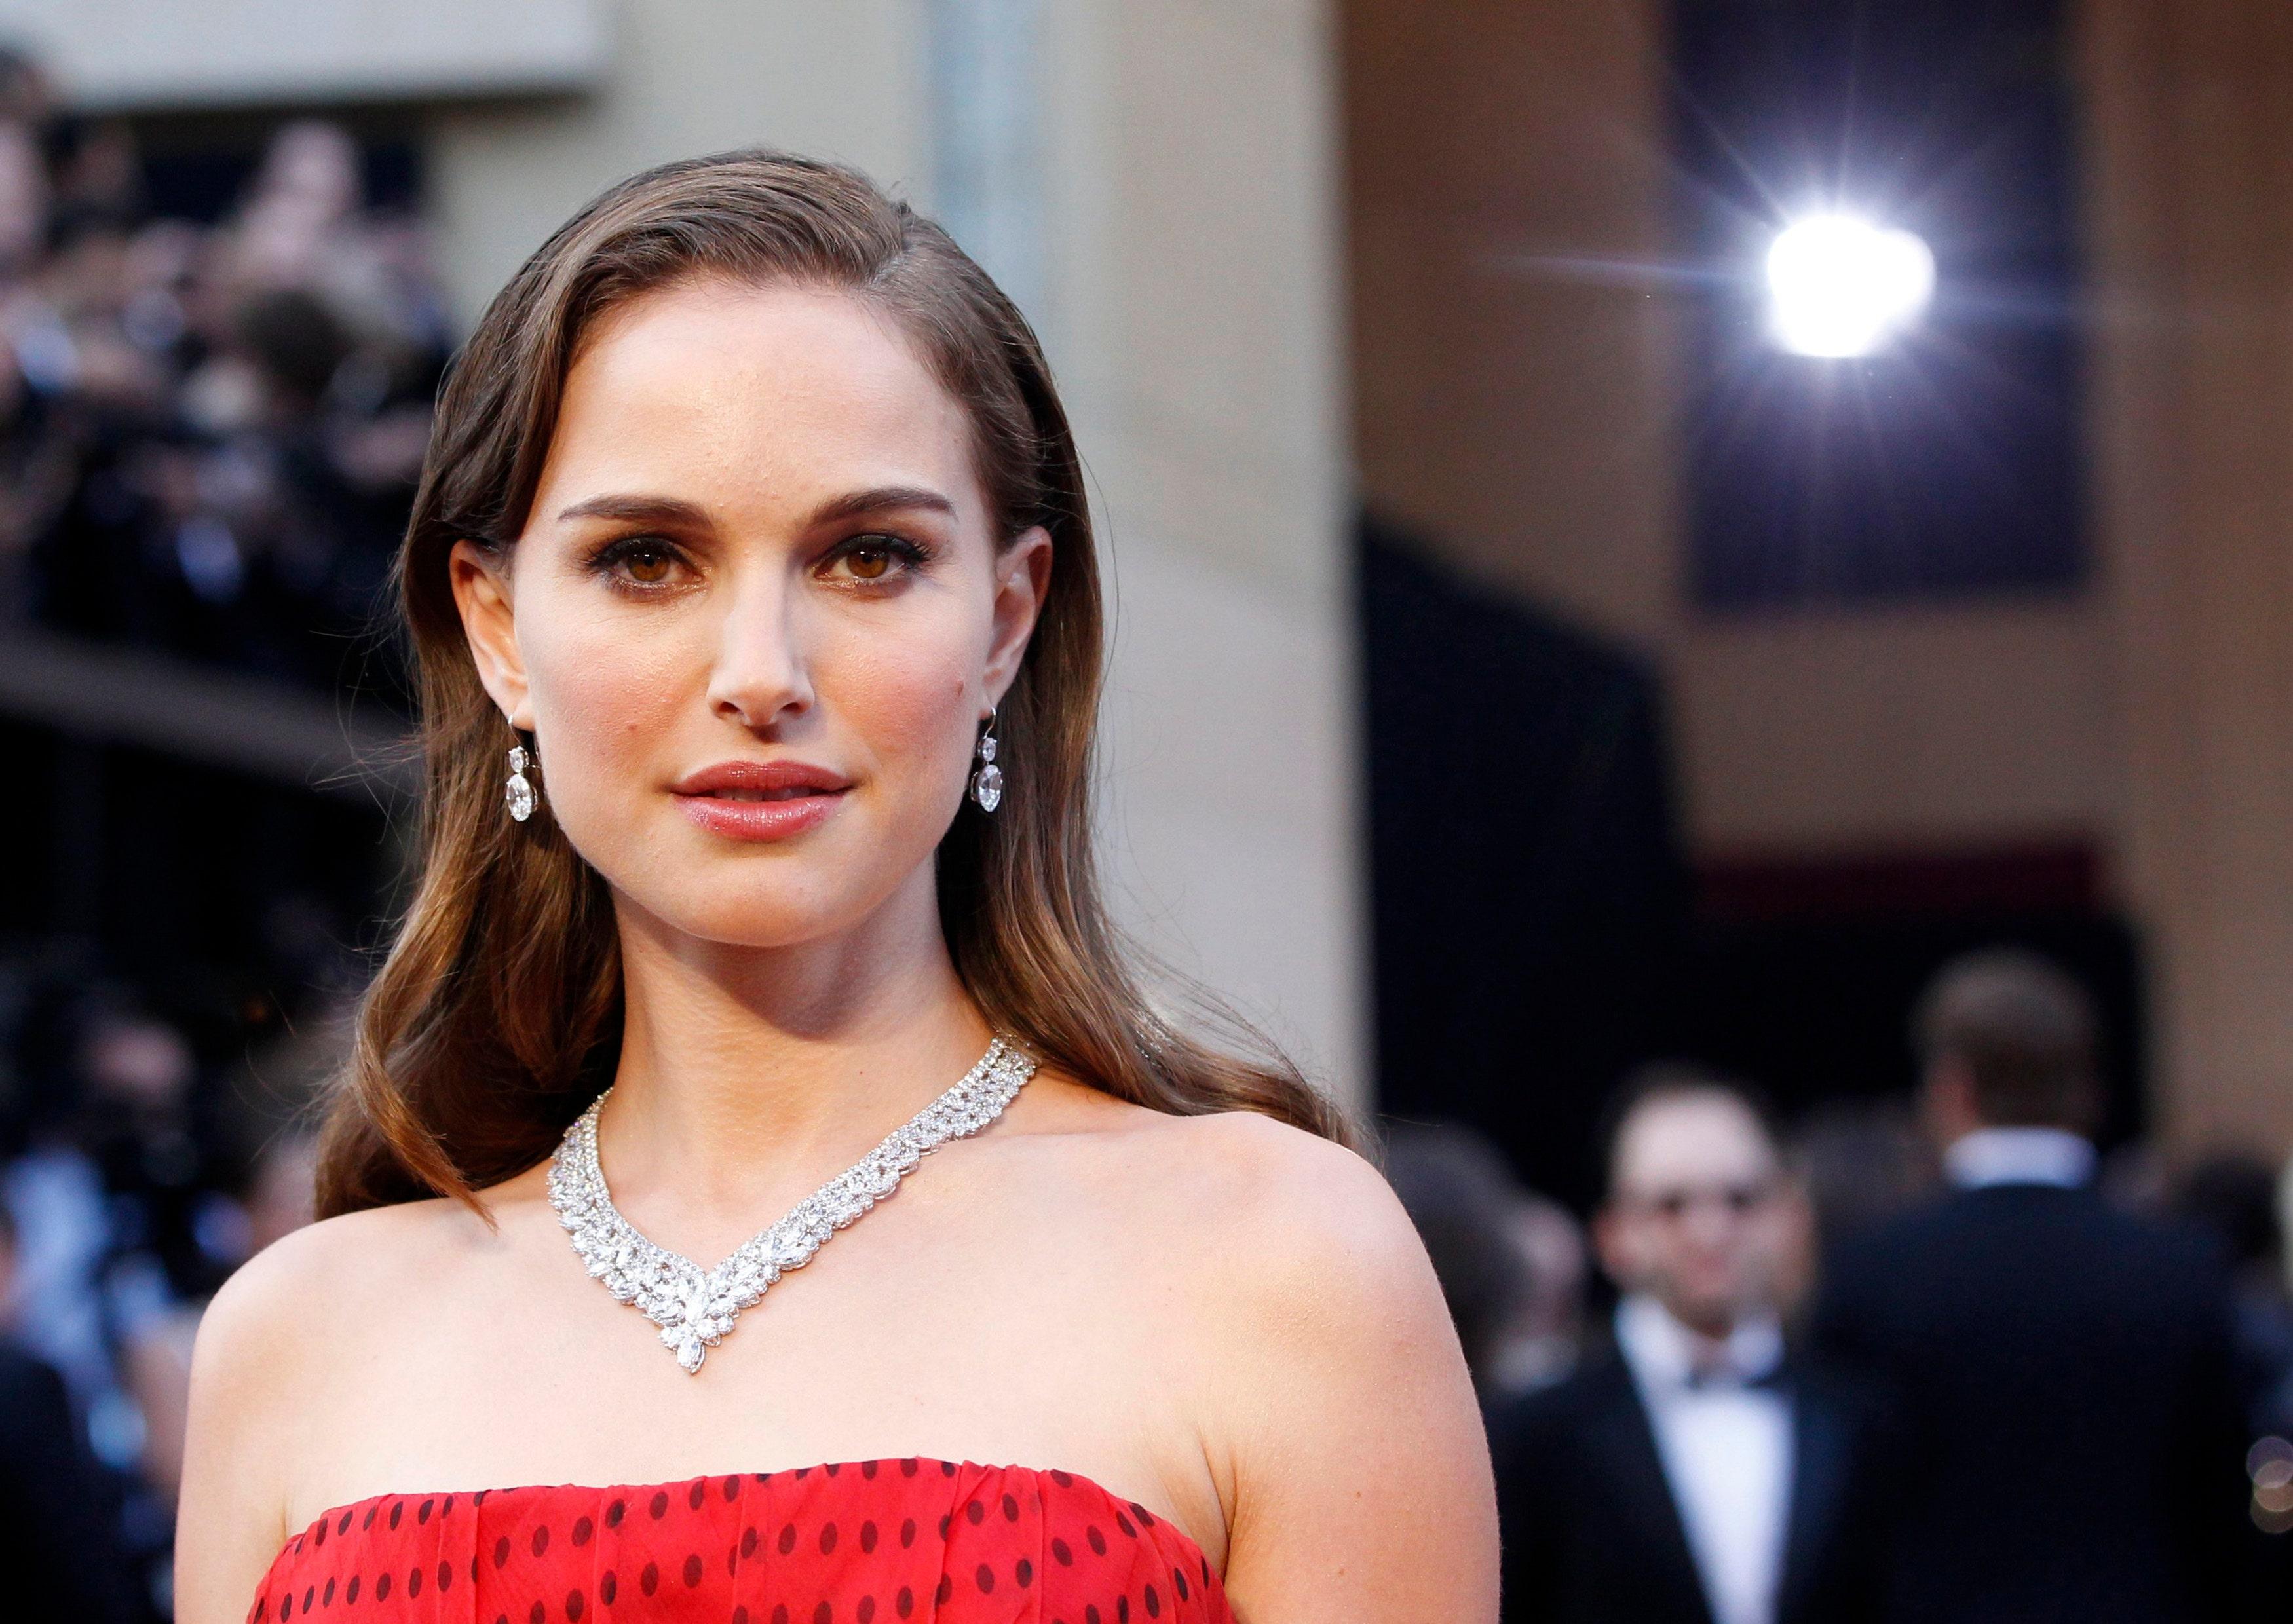 How 'Star Wars' nearly ruined Natalie Portman's career